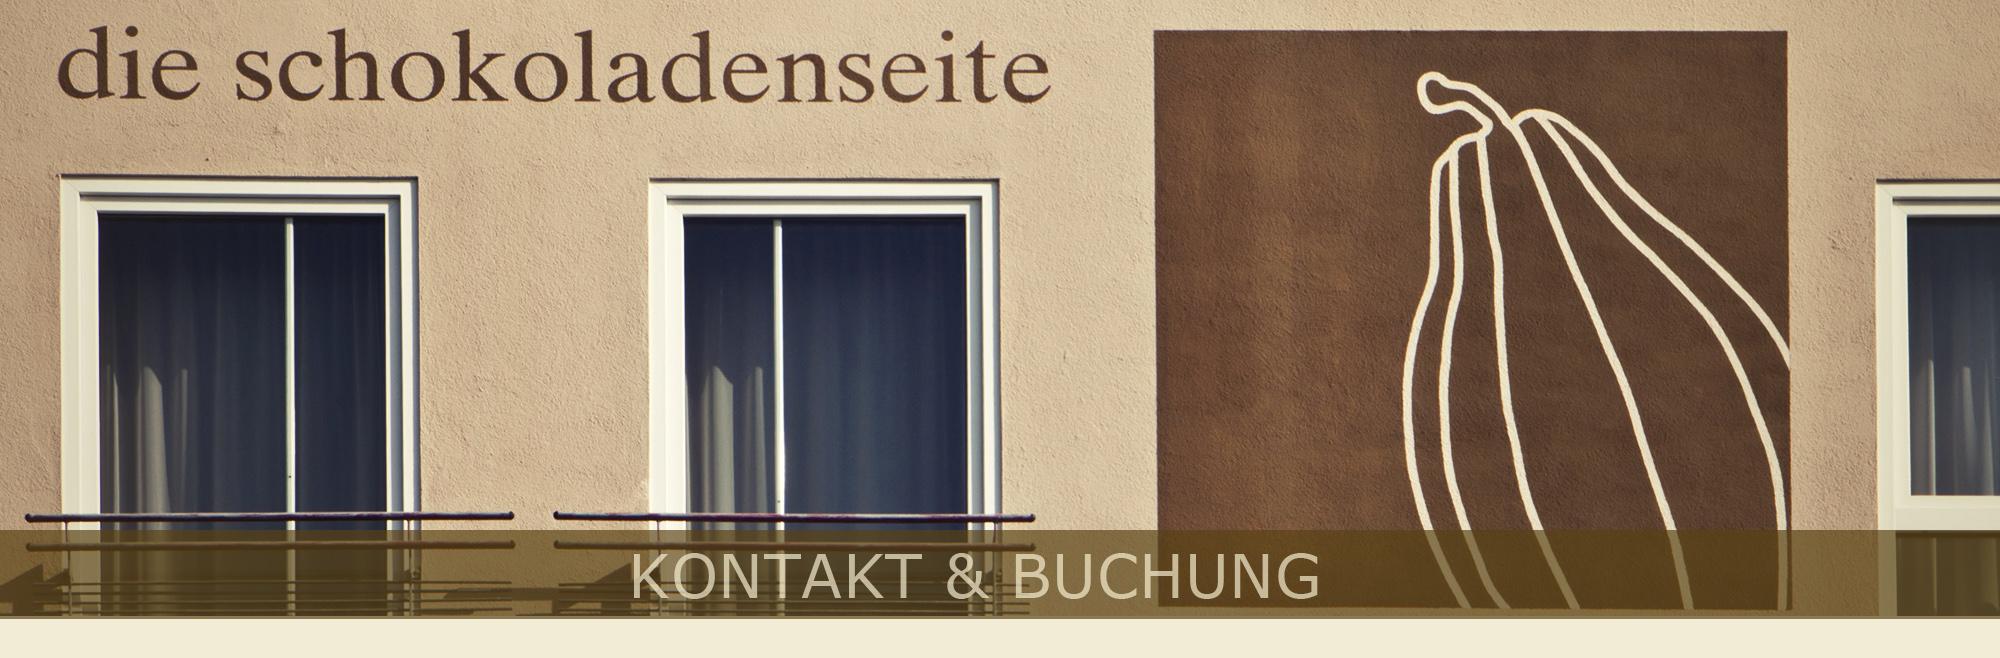 Landshut - Hotel Lifestyle Kontakt & Buchung